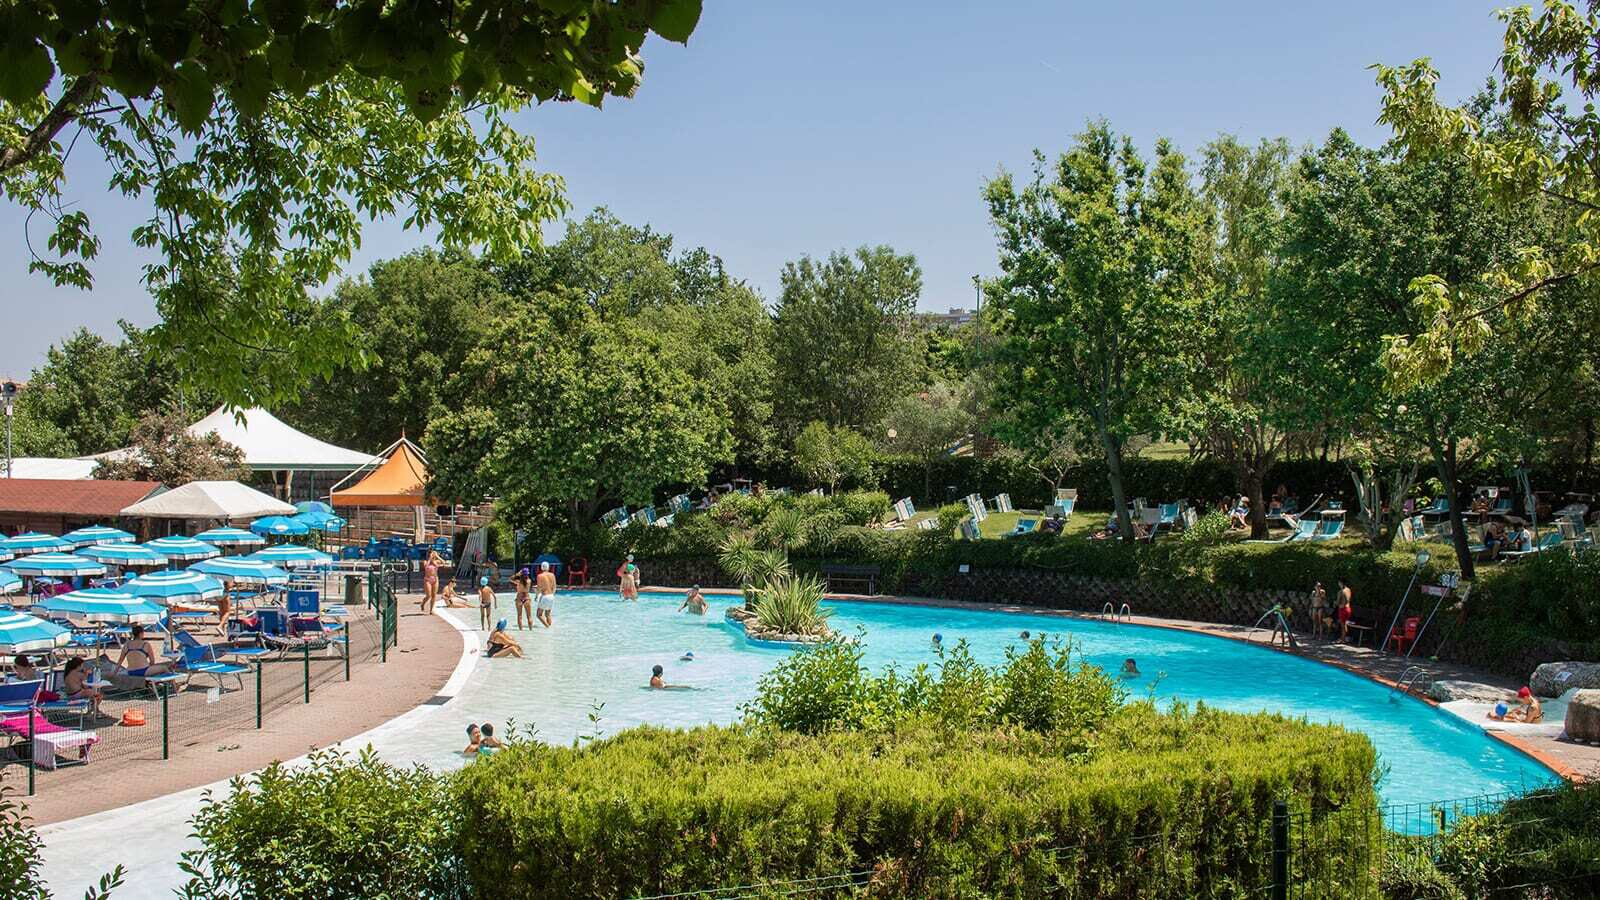 Campsite - Centro Vacanze San Marino